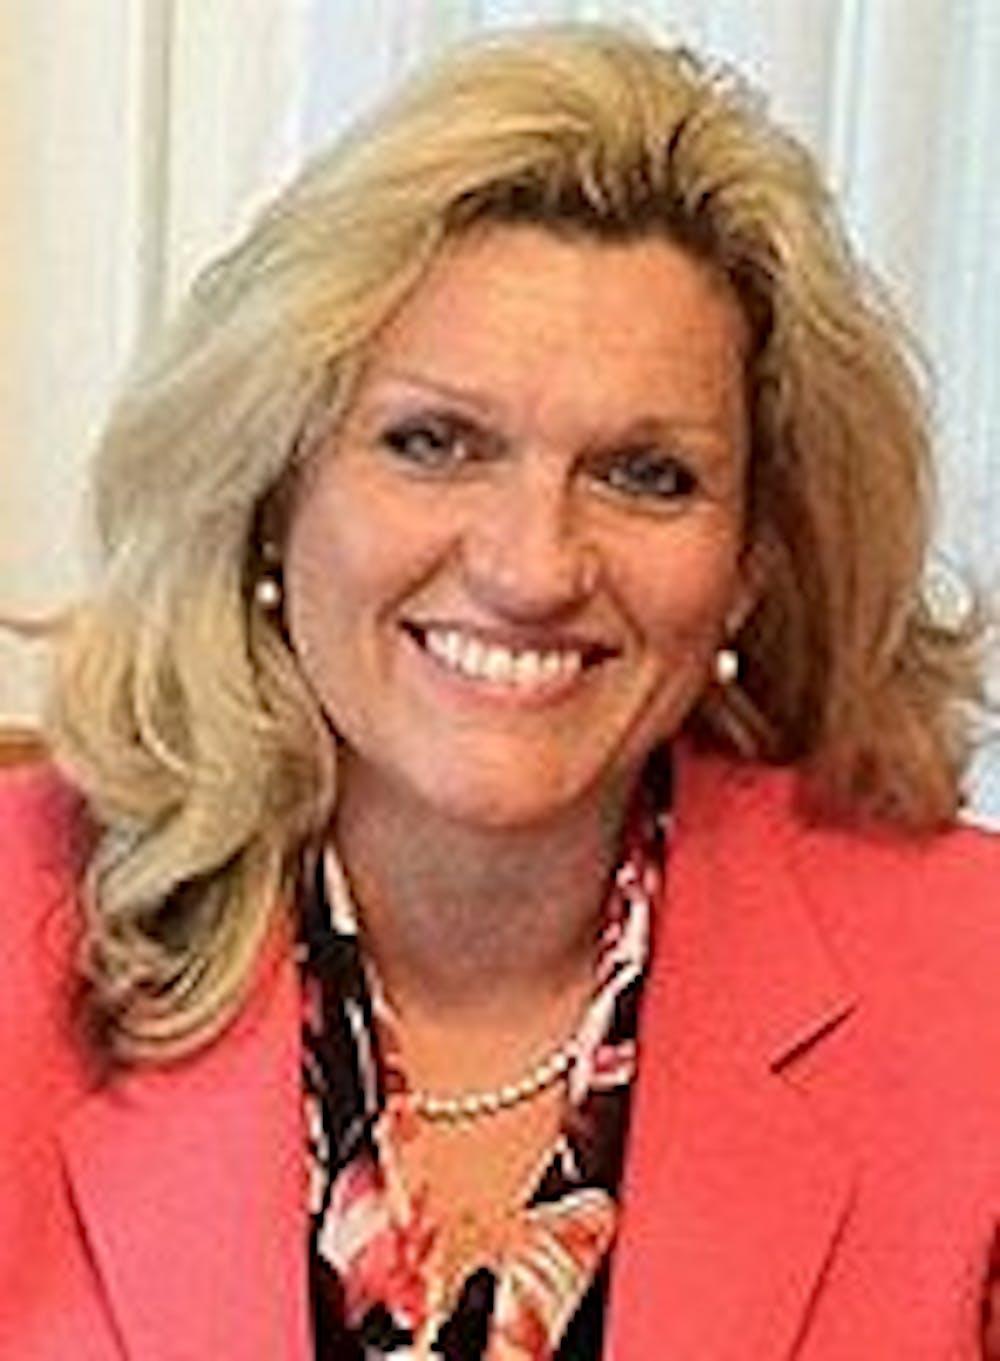 Orange County hires new schools superintendent